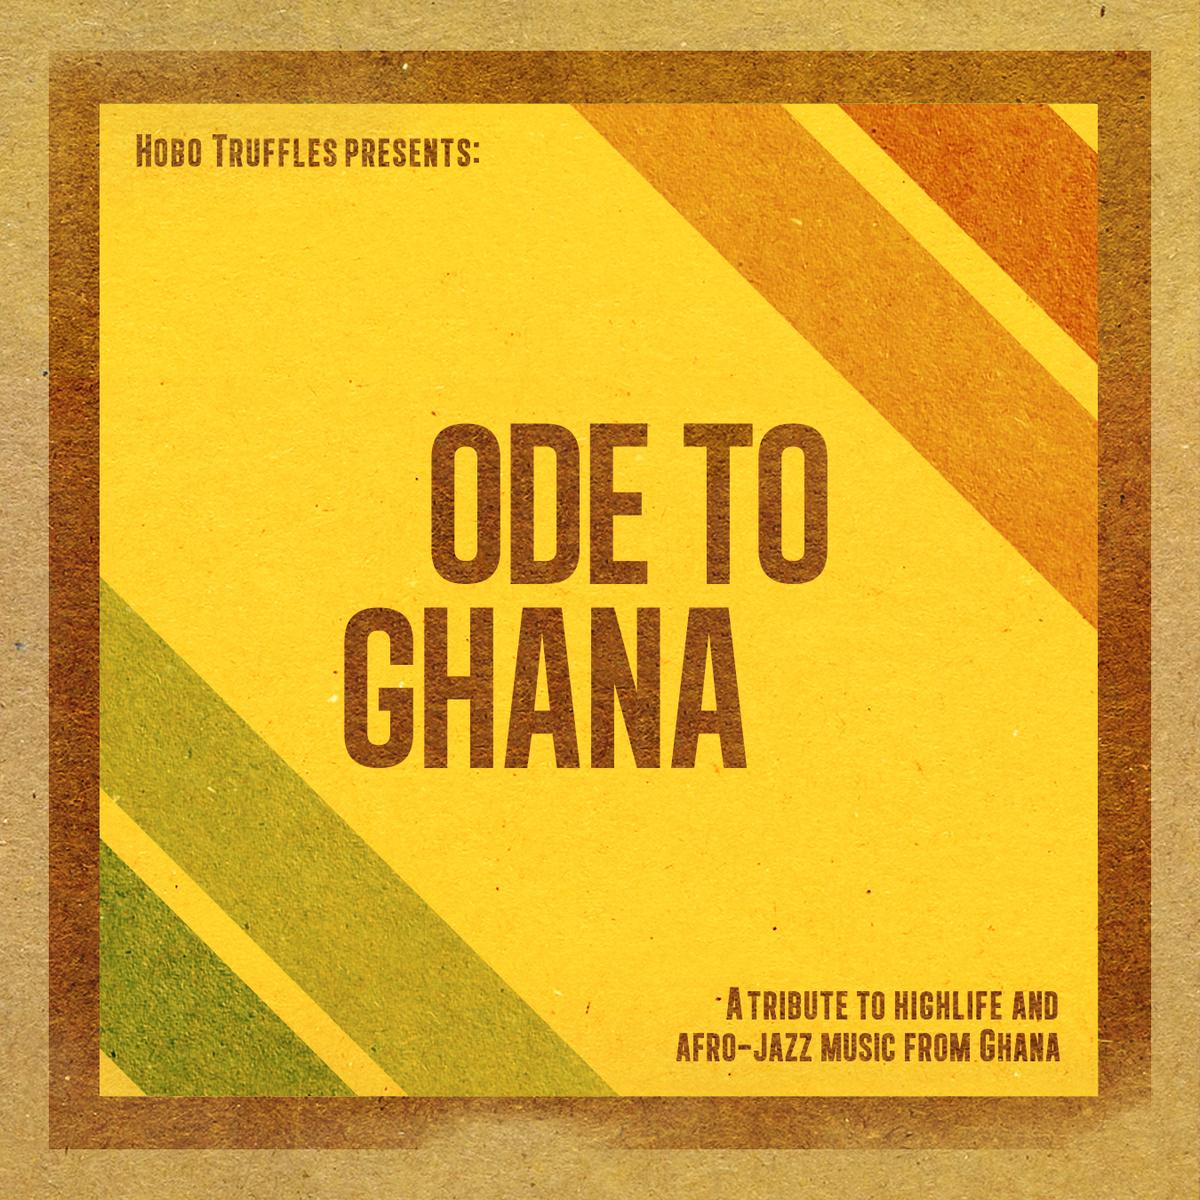 Free Download: Hobo Truffles Presents – Ode To Ghana